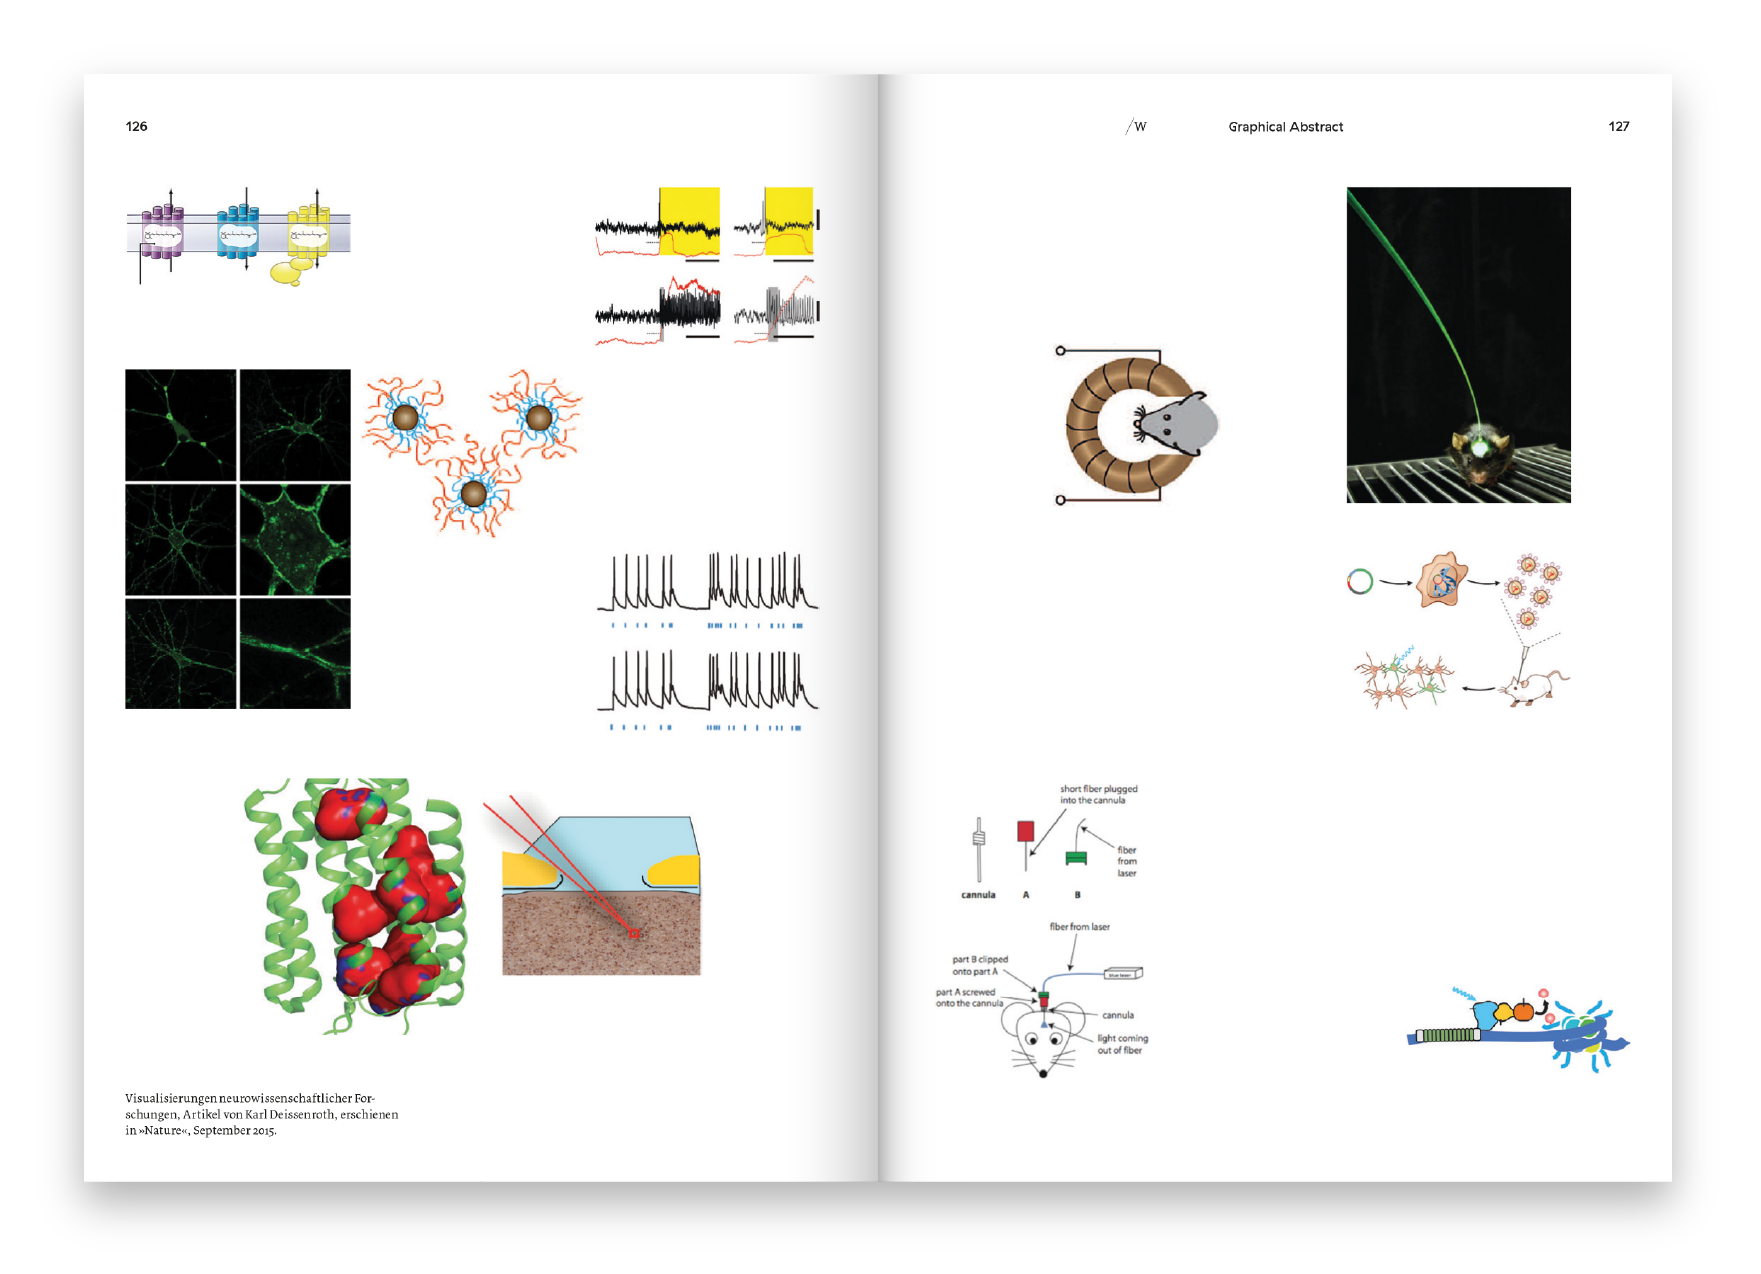 codes-of-collaboration-isabel-kronenberger-buch-11